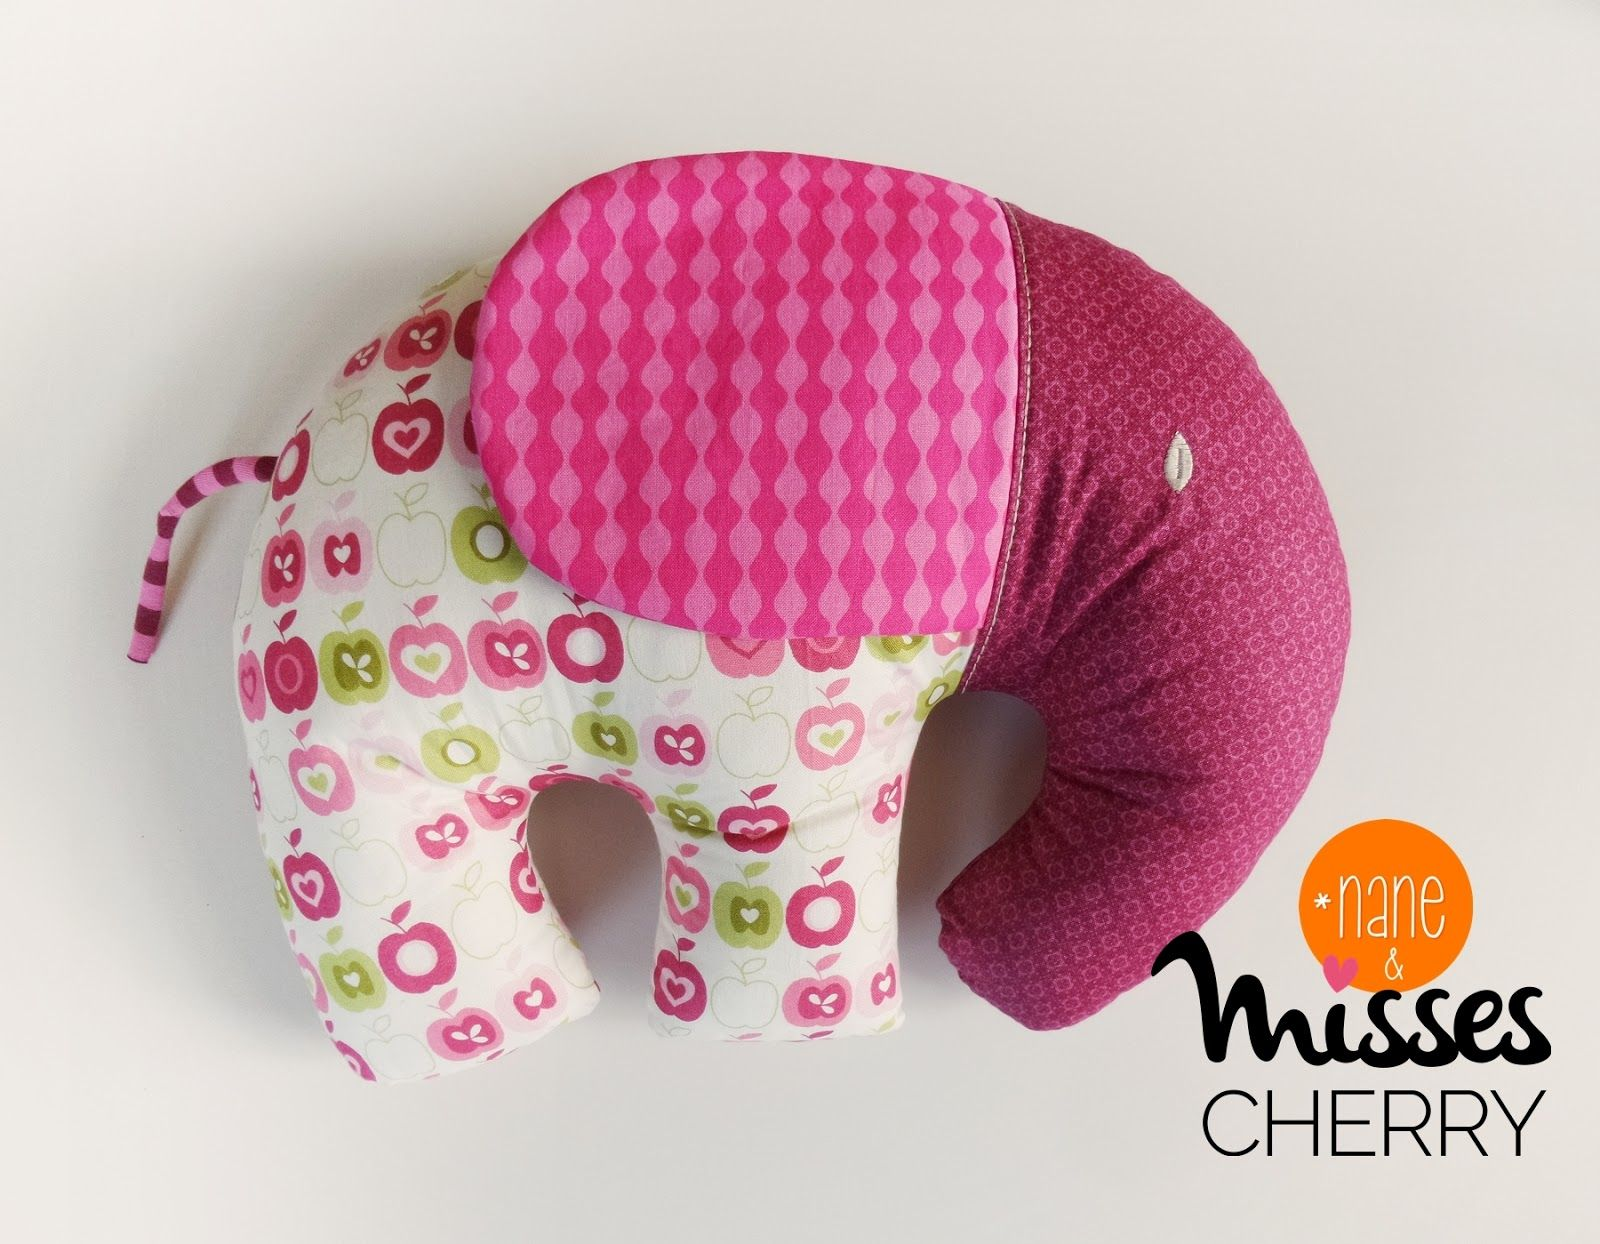 Elefantenkissen (Misses Cherry) | Pinterest | Kostenlos ...